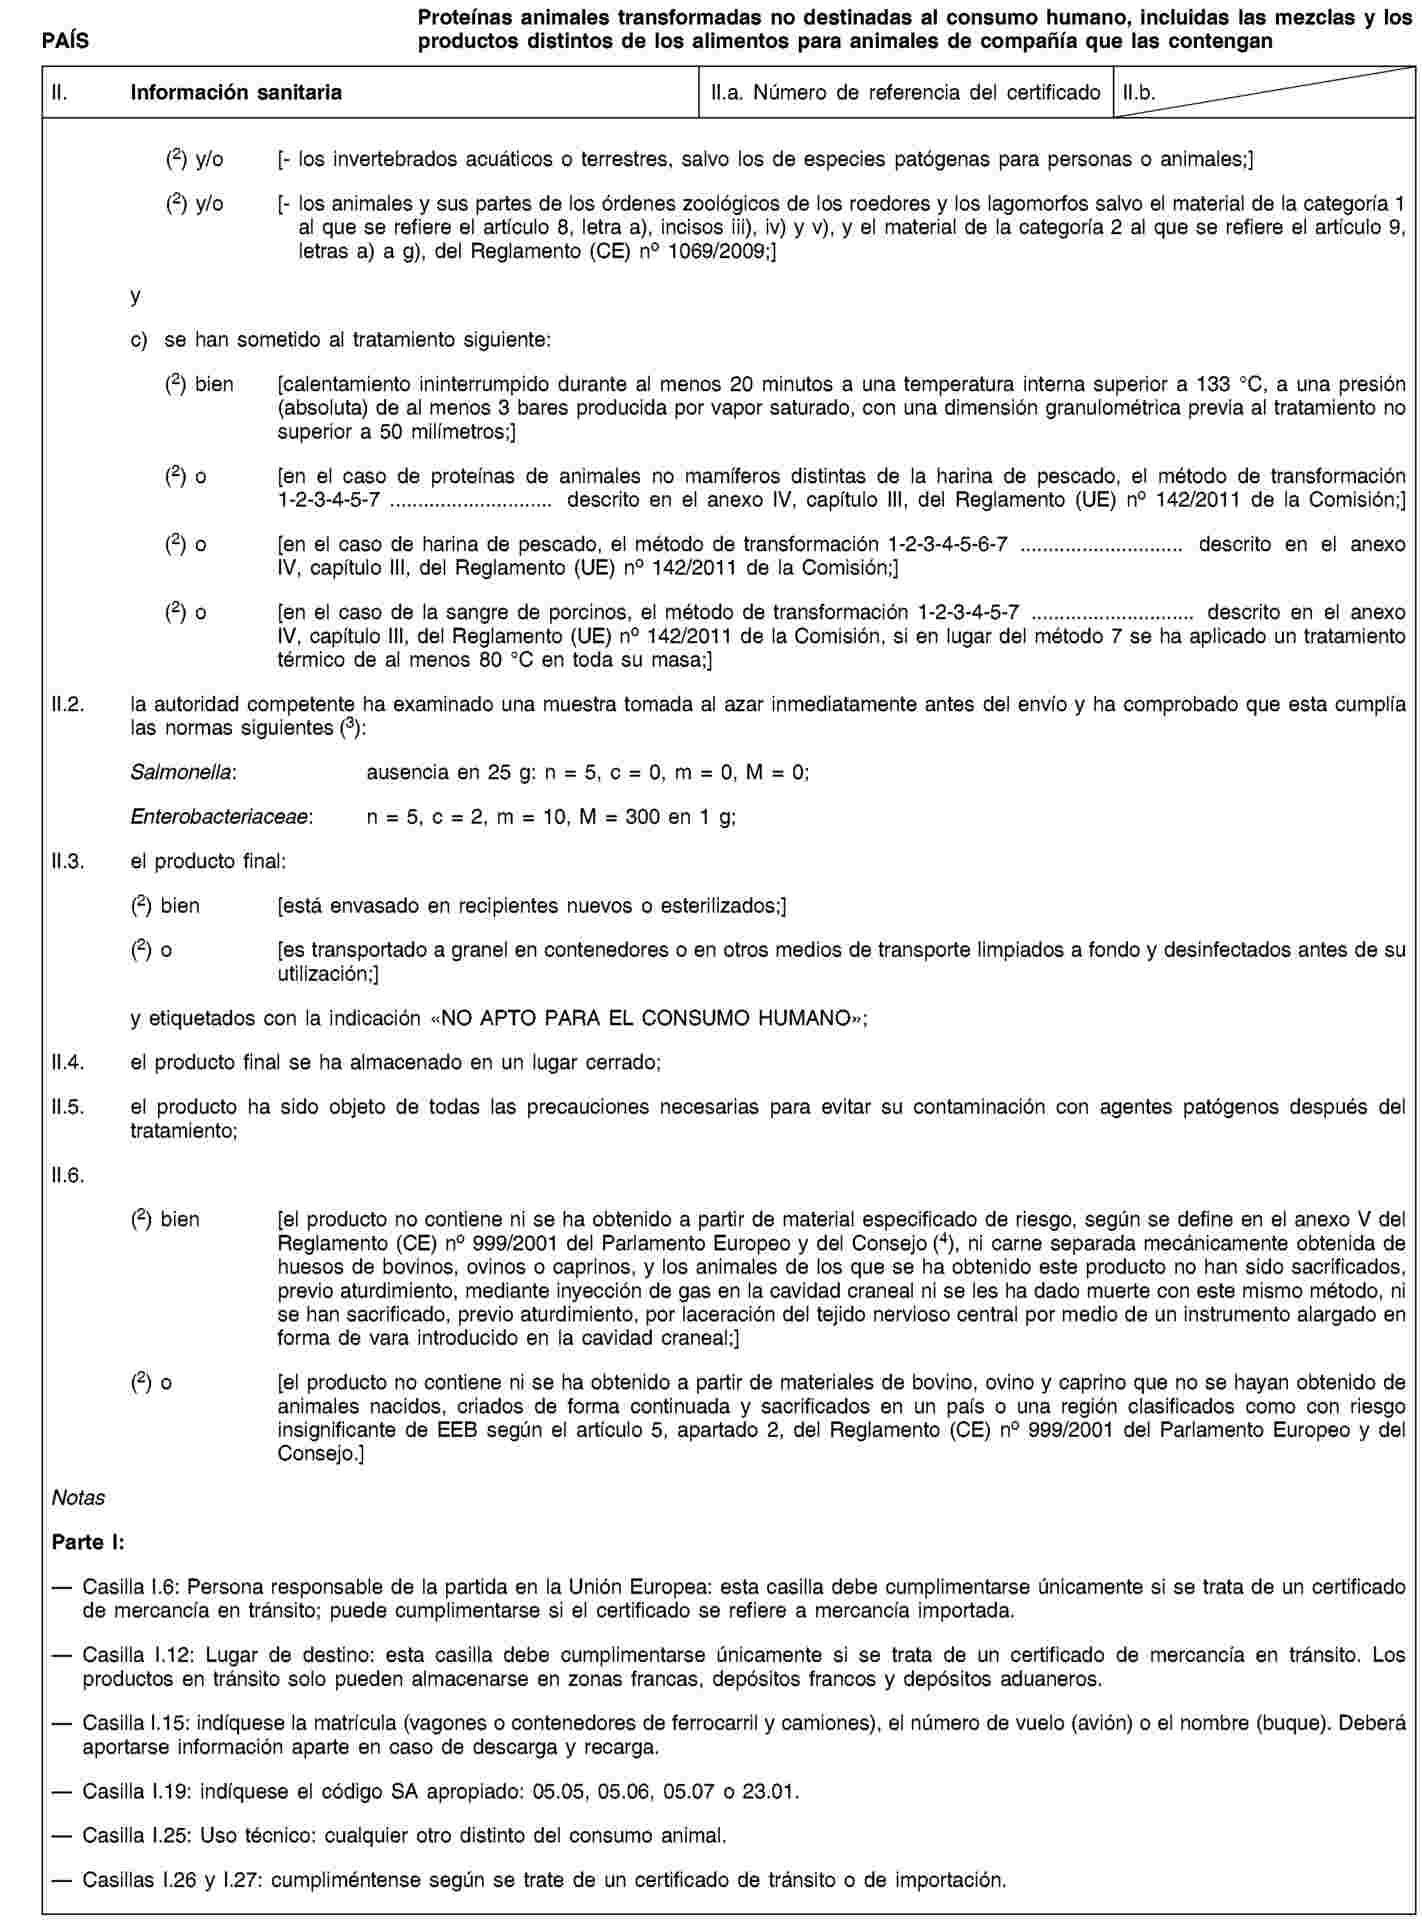 Imagen: https://eur-lex.europa.eu/resource.html?uri=uriserv:OJ.L_.2011.054.01.0001.01.SPA.xhtml.L_2011054ES.01012201.tif.jpg